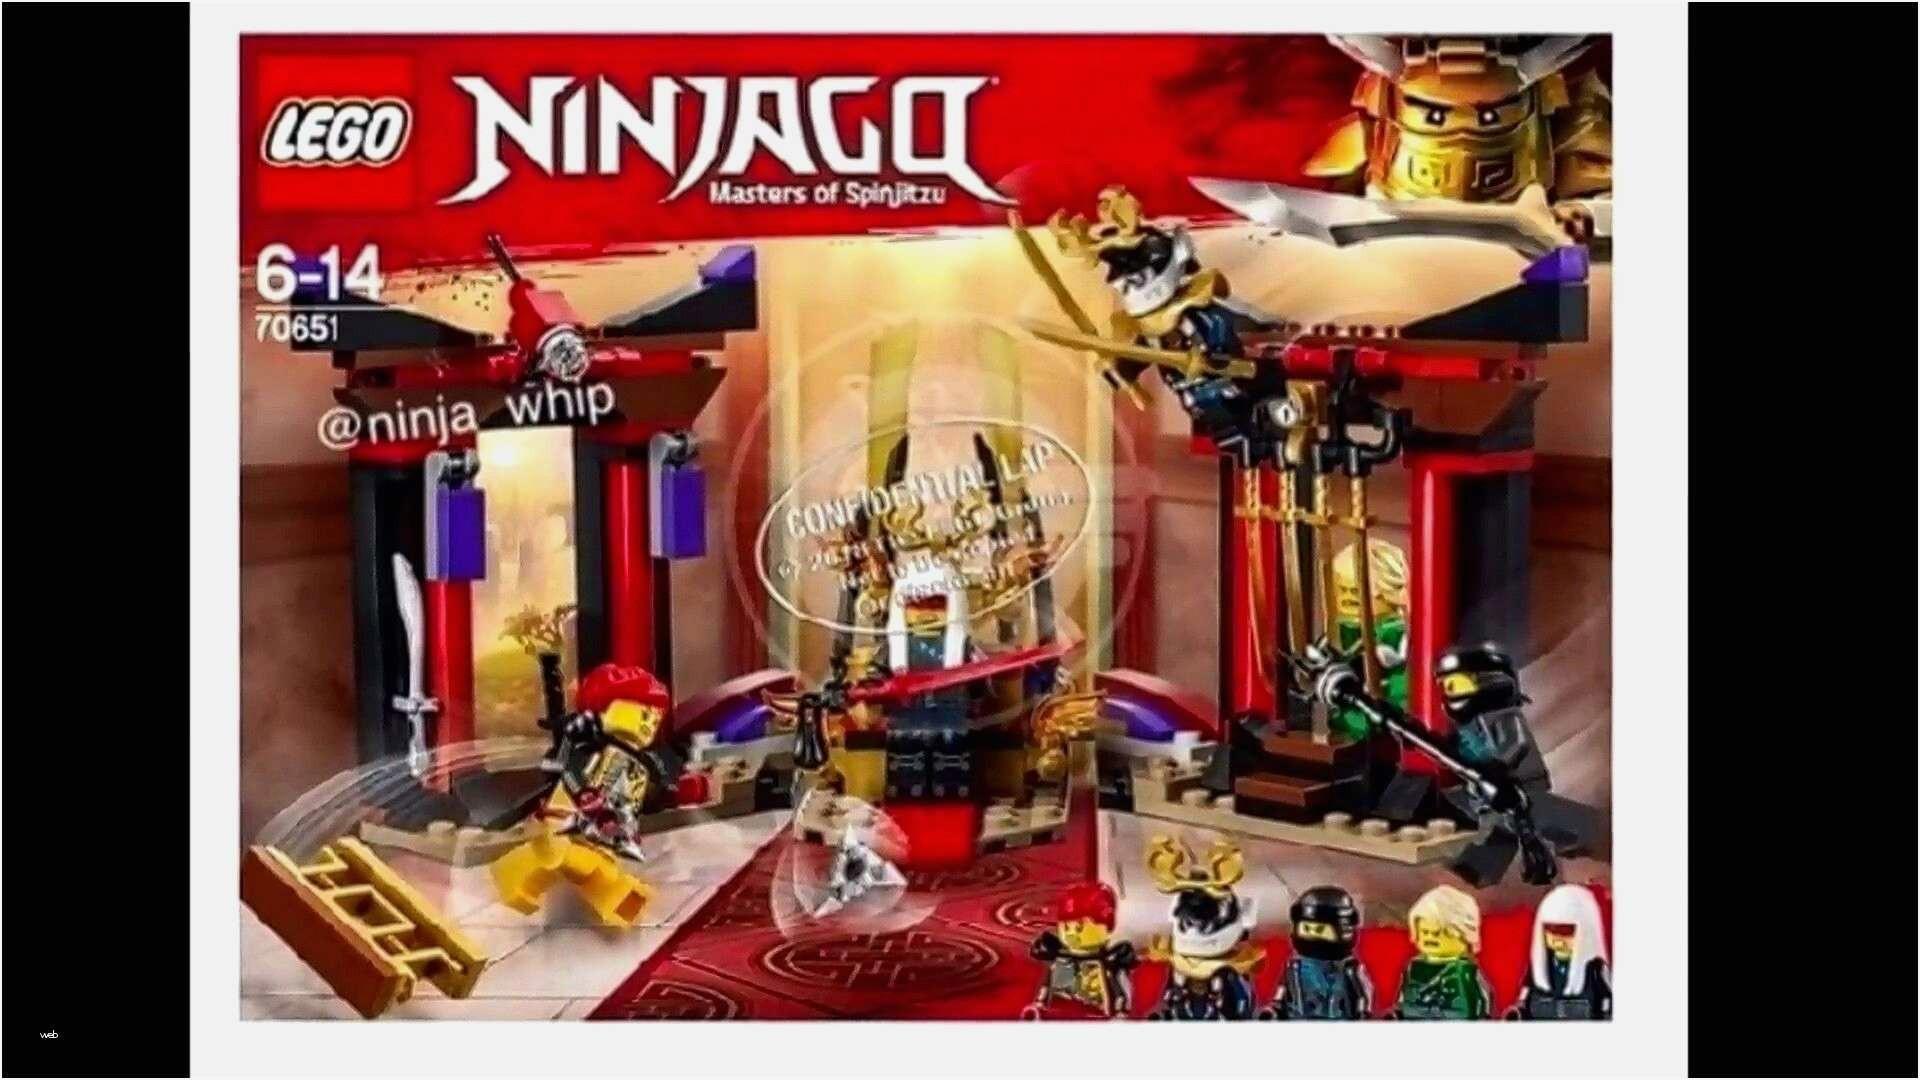 Ninjago Lego Ausmalbilder Inspirierend Lego Ninjago Ausmalbild Beispielbilder Färben Lego Ninjago Birthday Das Bild